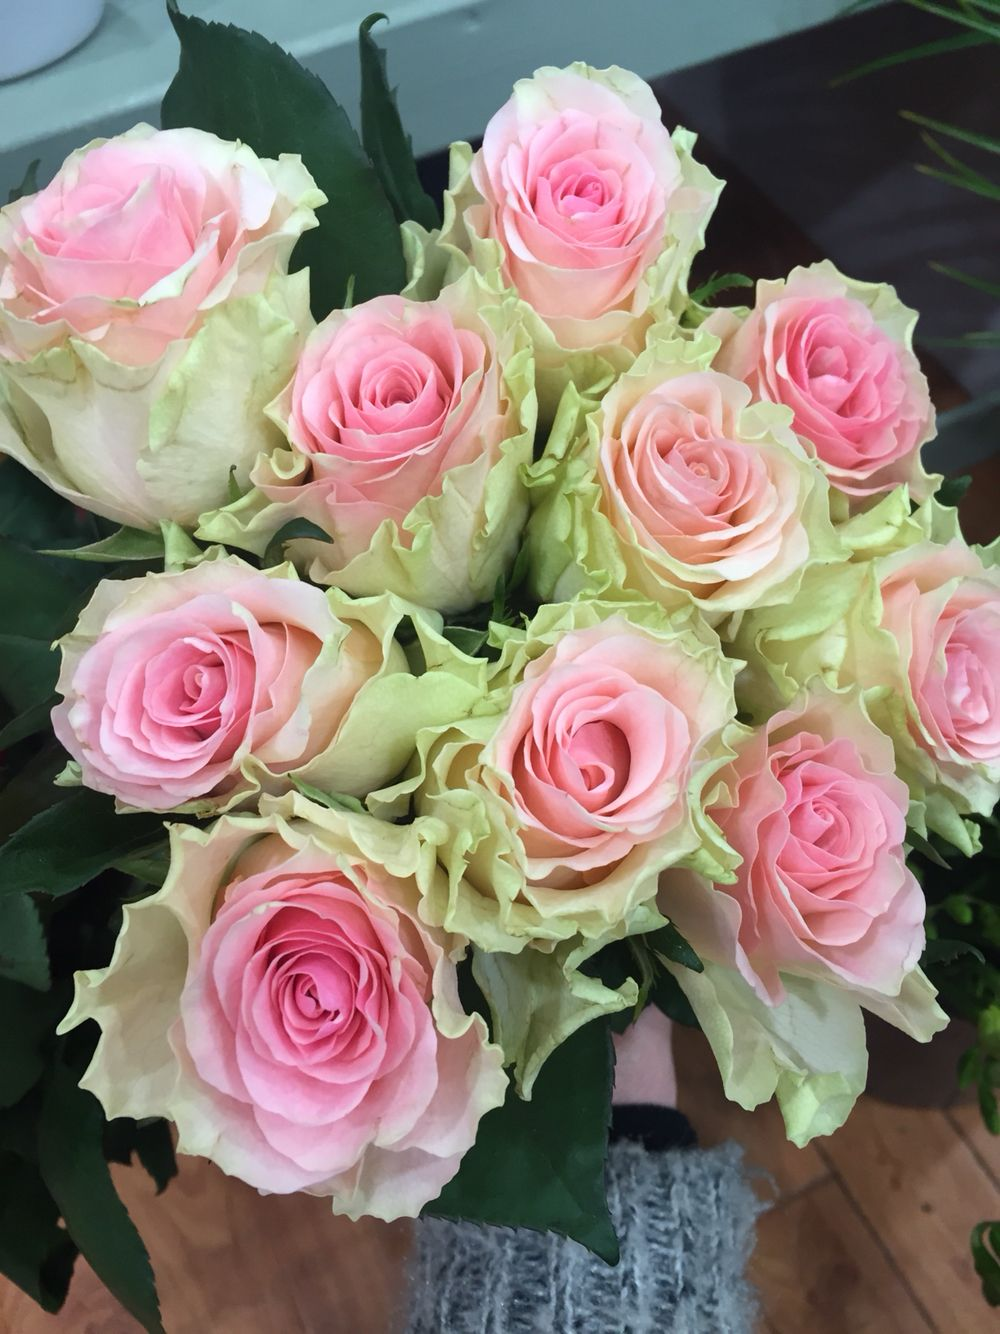 #pallotsflorist #pallotflowers #sthelier #jersey #jerseyci #cheapside #floristjerseyci #weddingsjerseyci #weddingflowers #topgear